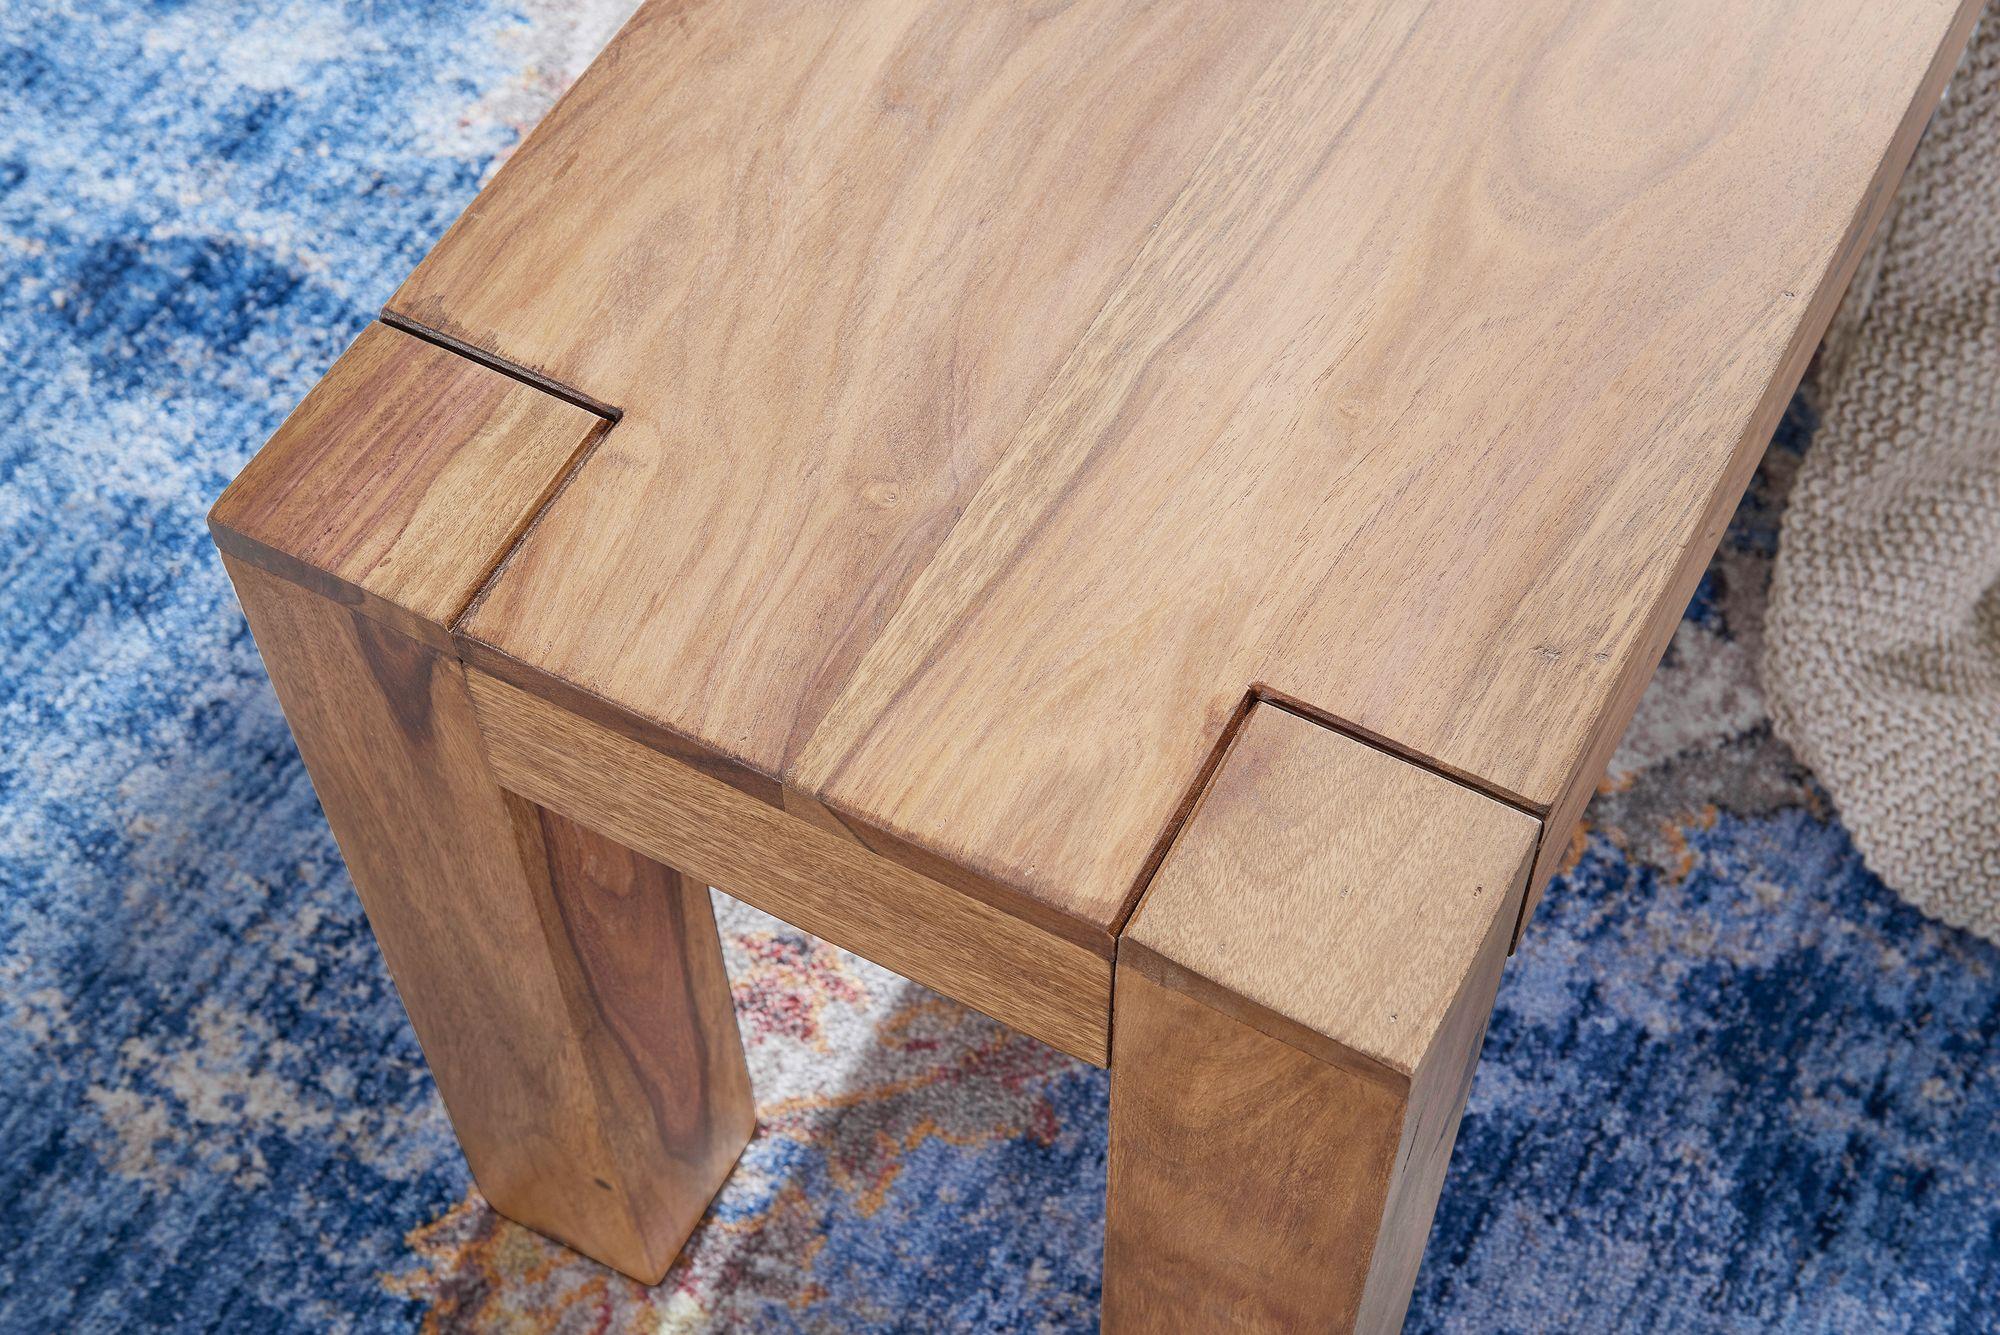 Finebuy Esszimmer Sitzbank Massiv Holz Akazie Holz Bank Natur Produkt Kuchenbank Im Landhaus Stil Grosse Wahlbar